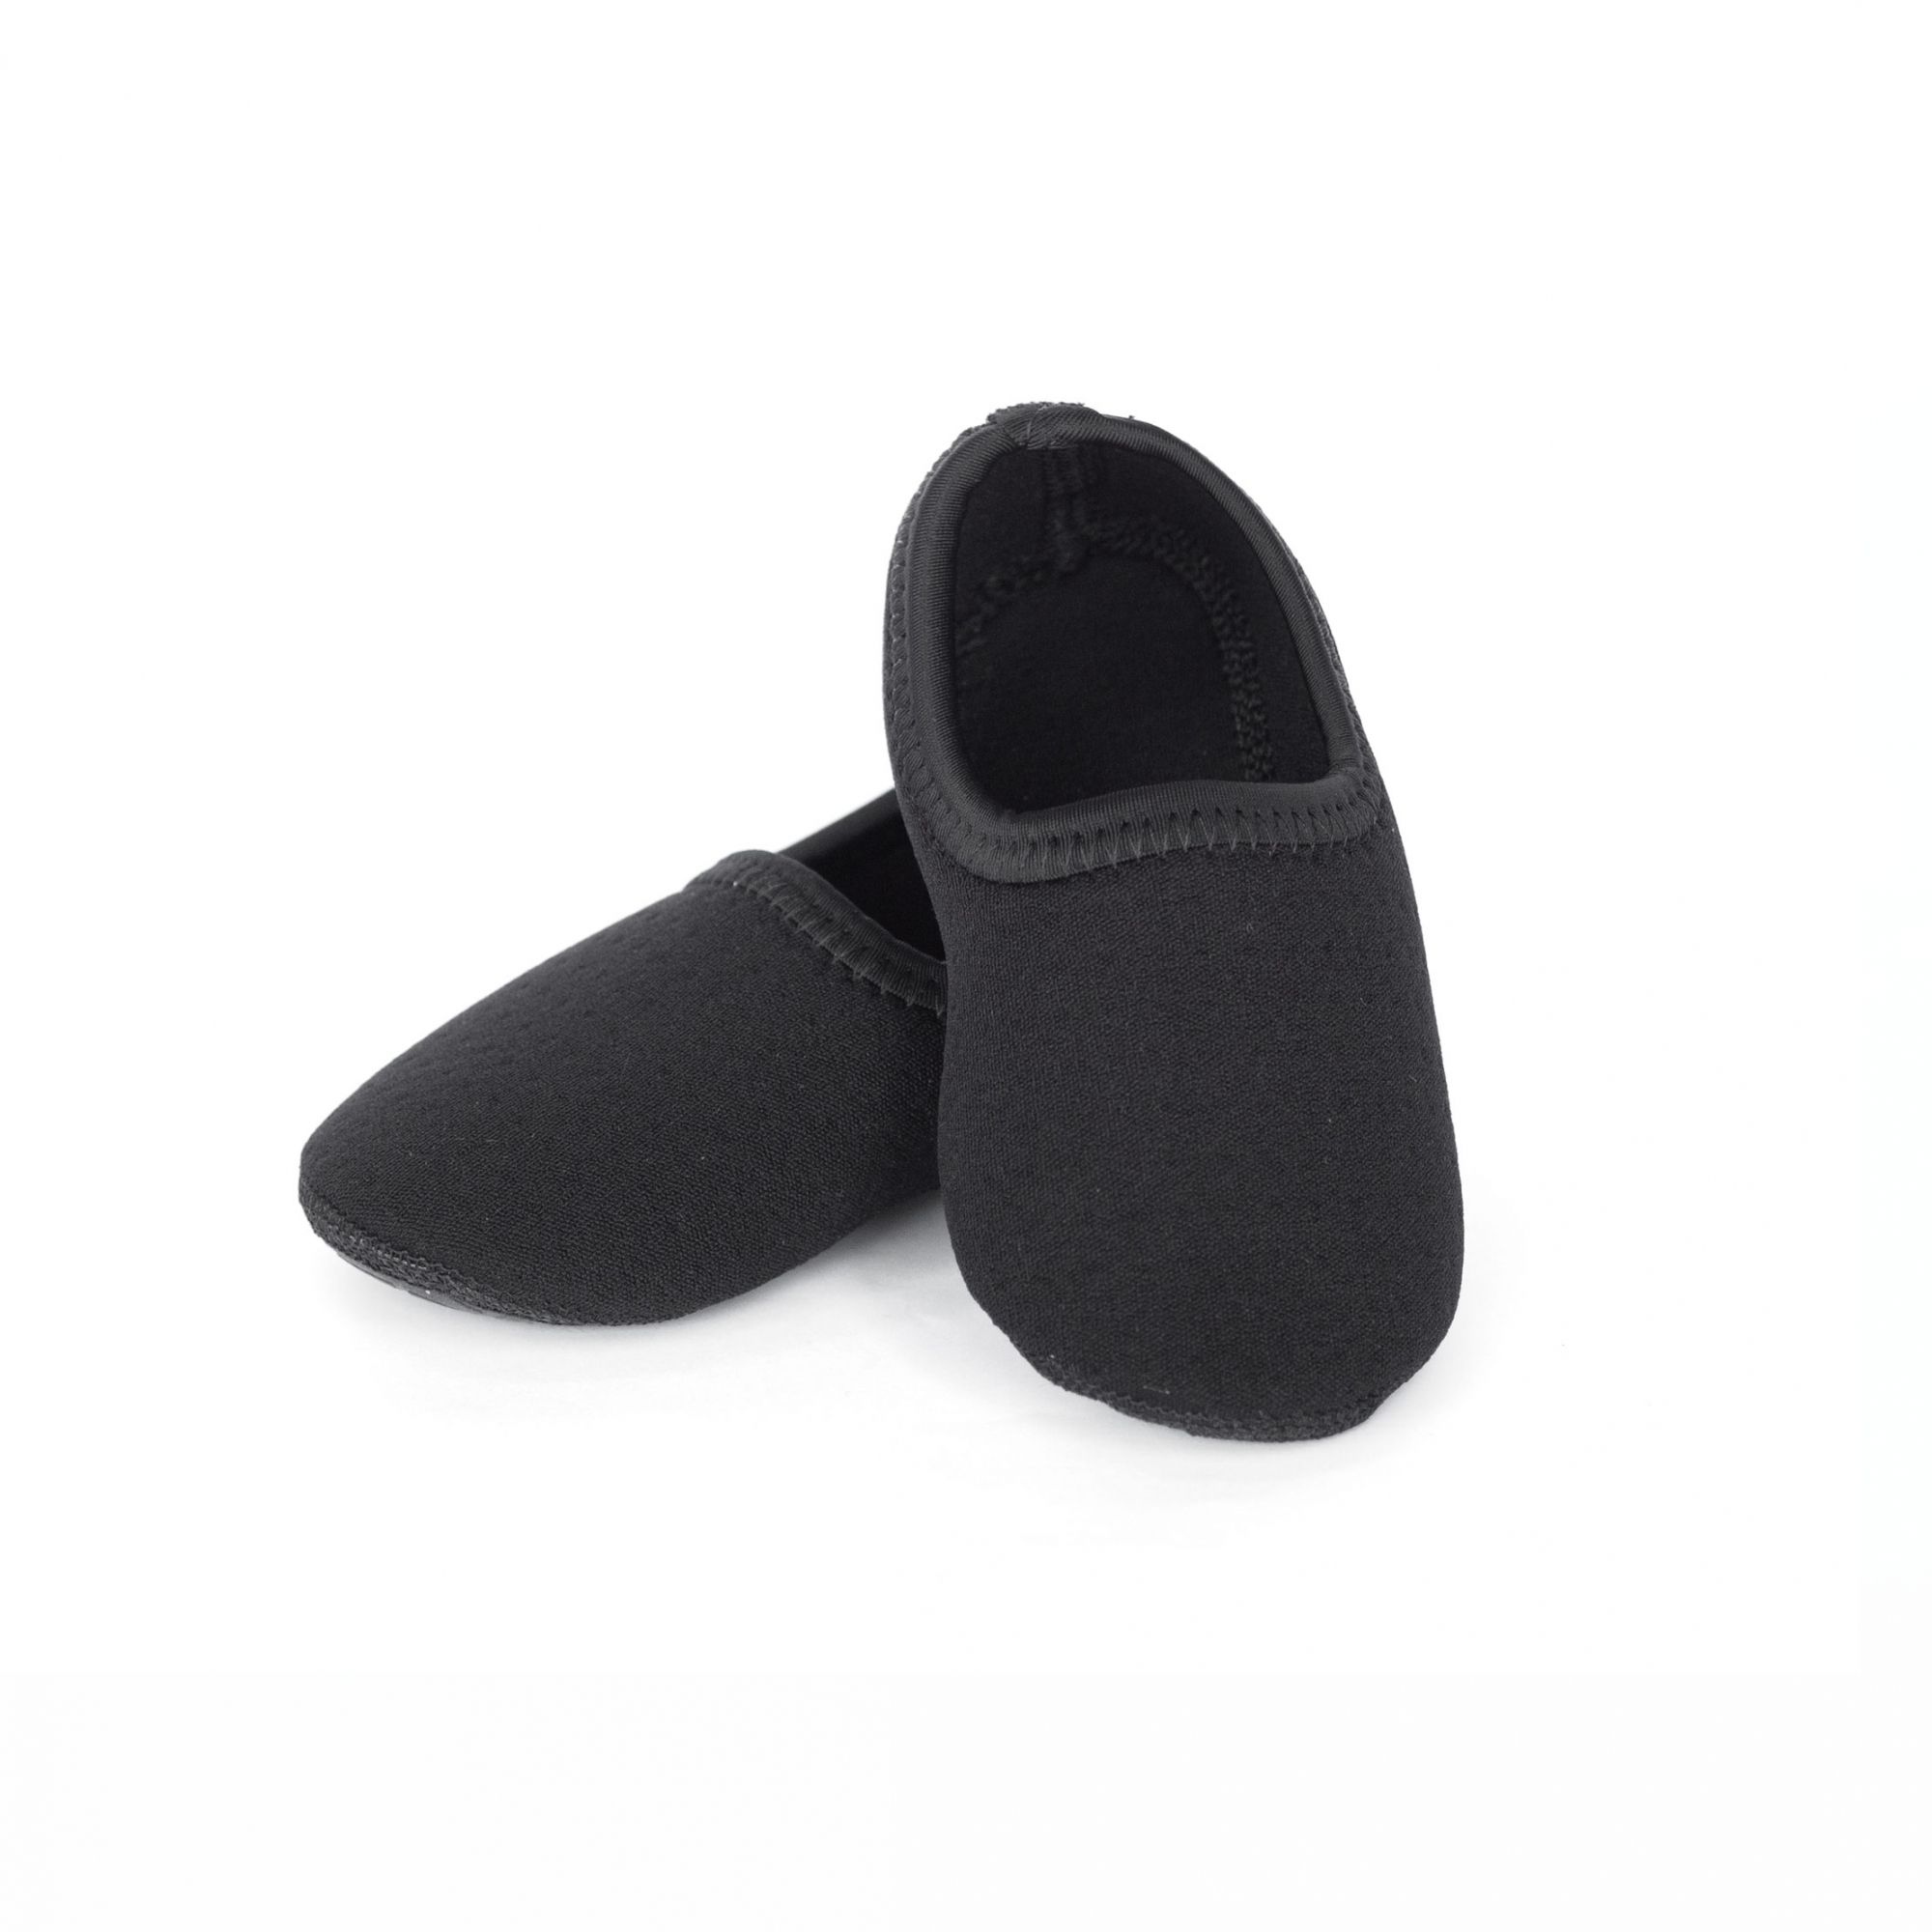 Sapato de Neoprene Infantil Fit Preto Ufrog